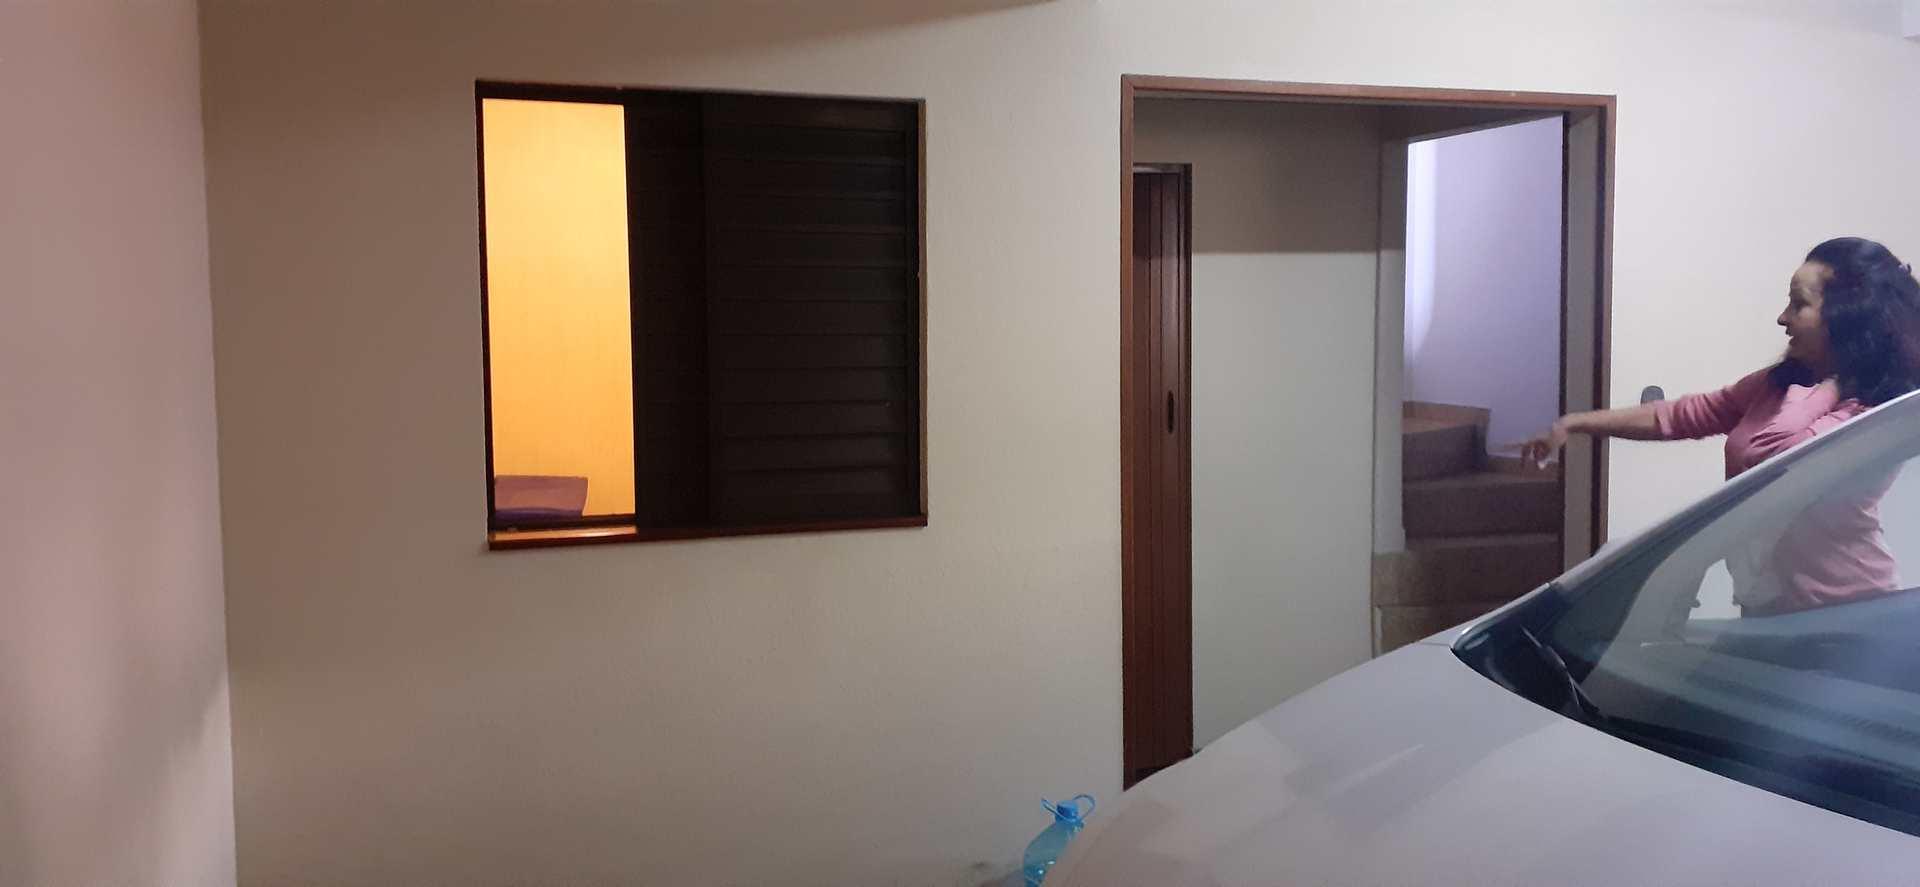 Sobrado com 3 dorms, Vila Pires, Santo André - R$ 800 mil, Cod: 1714